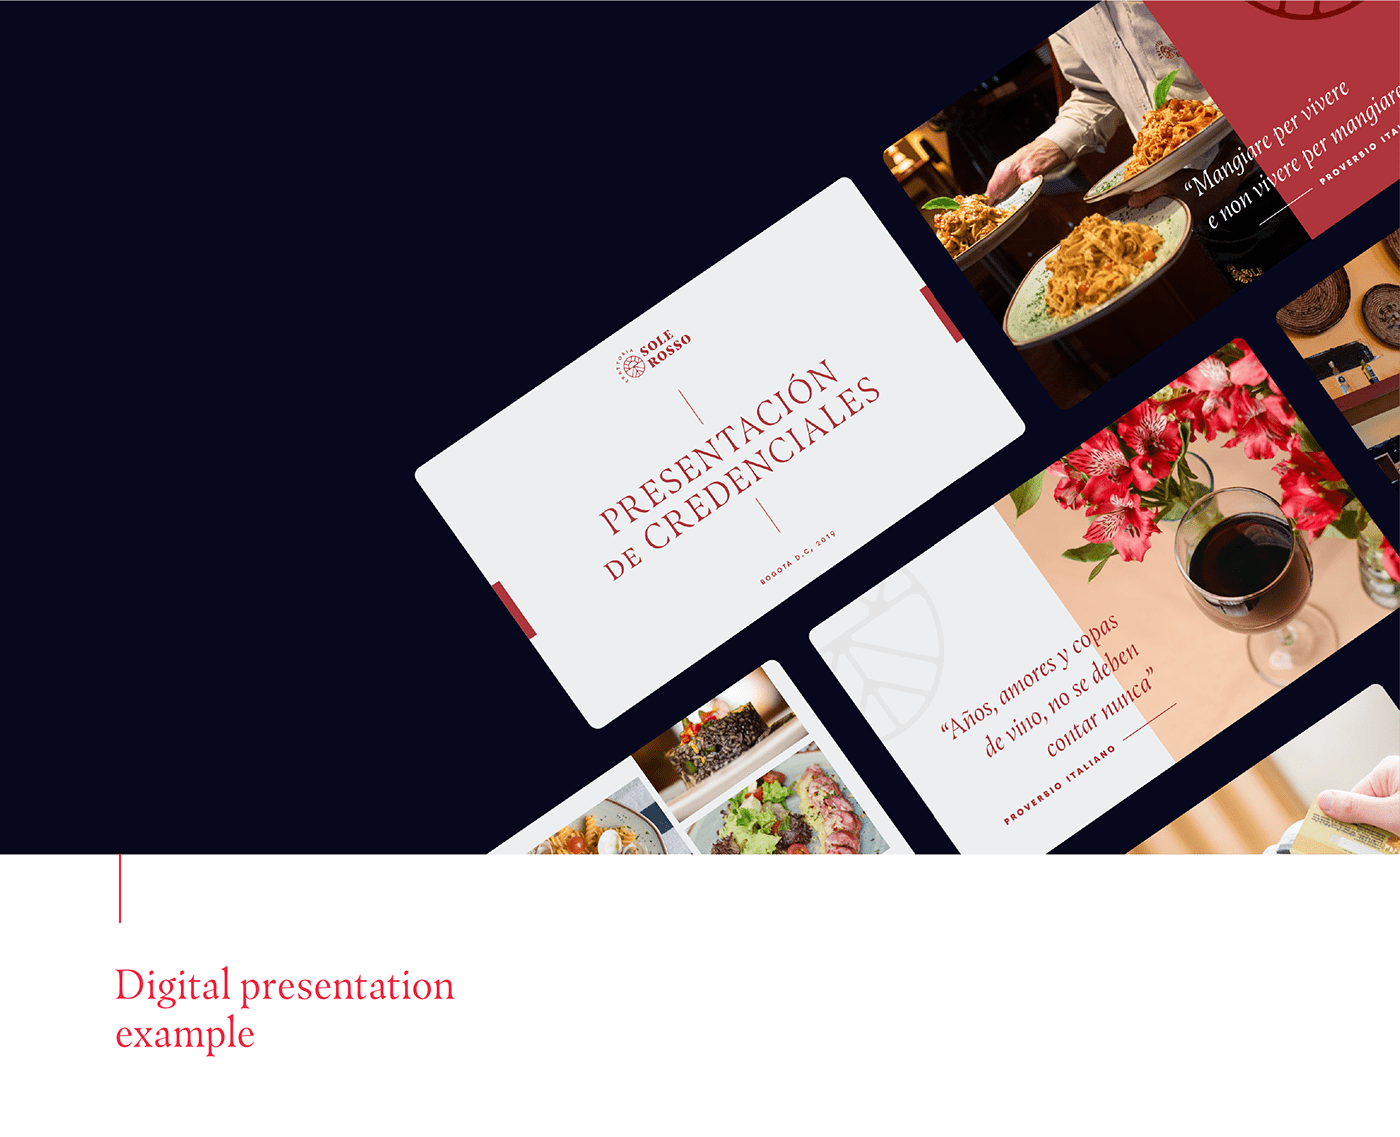 restaurant,gourmet,italian,sardinian,menu,elegant,Food ,Pasta,trattoria,restaurante